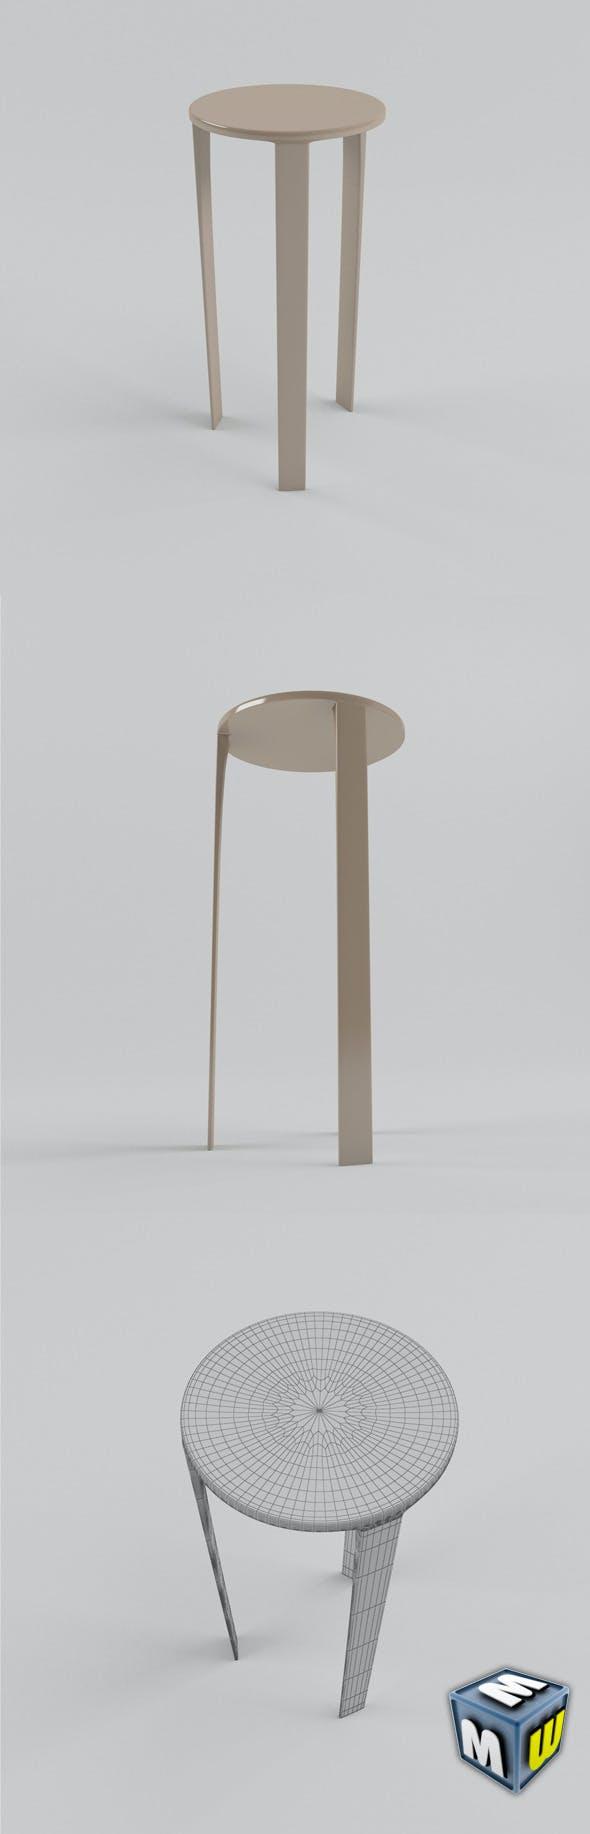 Stool MAX 2011 - 3DOcean Item for Sale